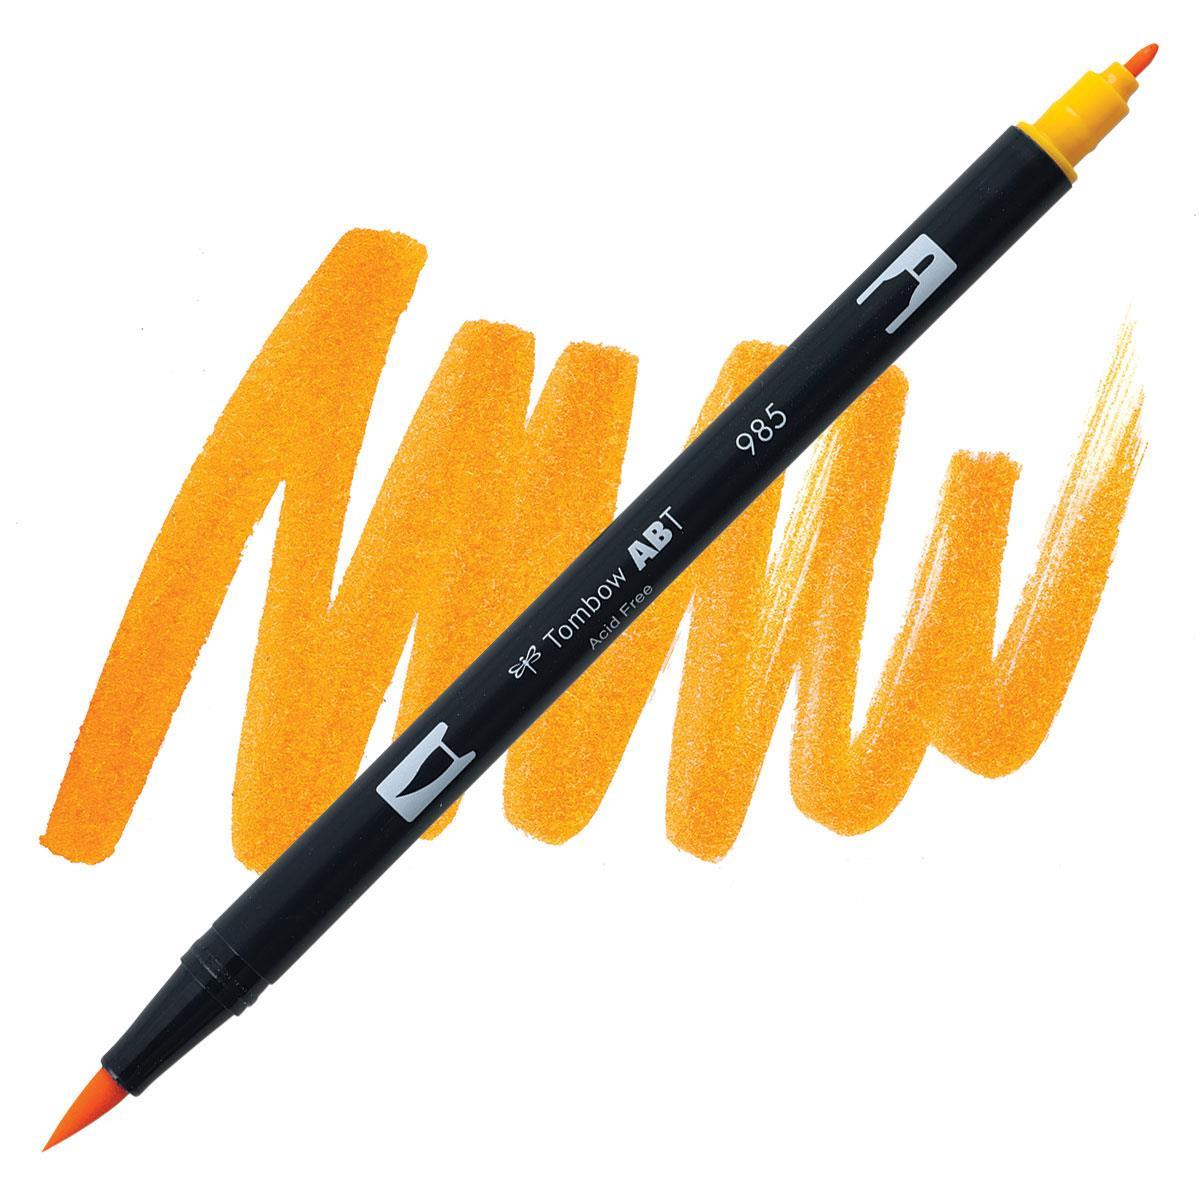 Chrome Yellow (985), Tombow Dual Brush Pens - 085014566162